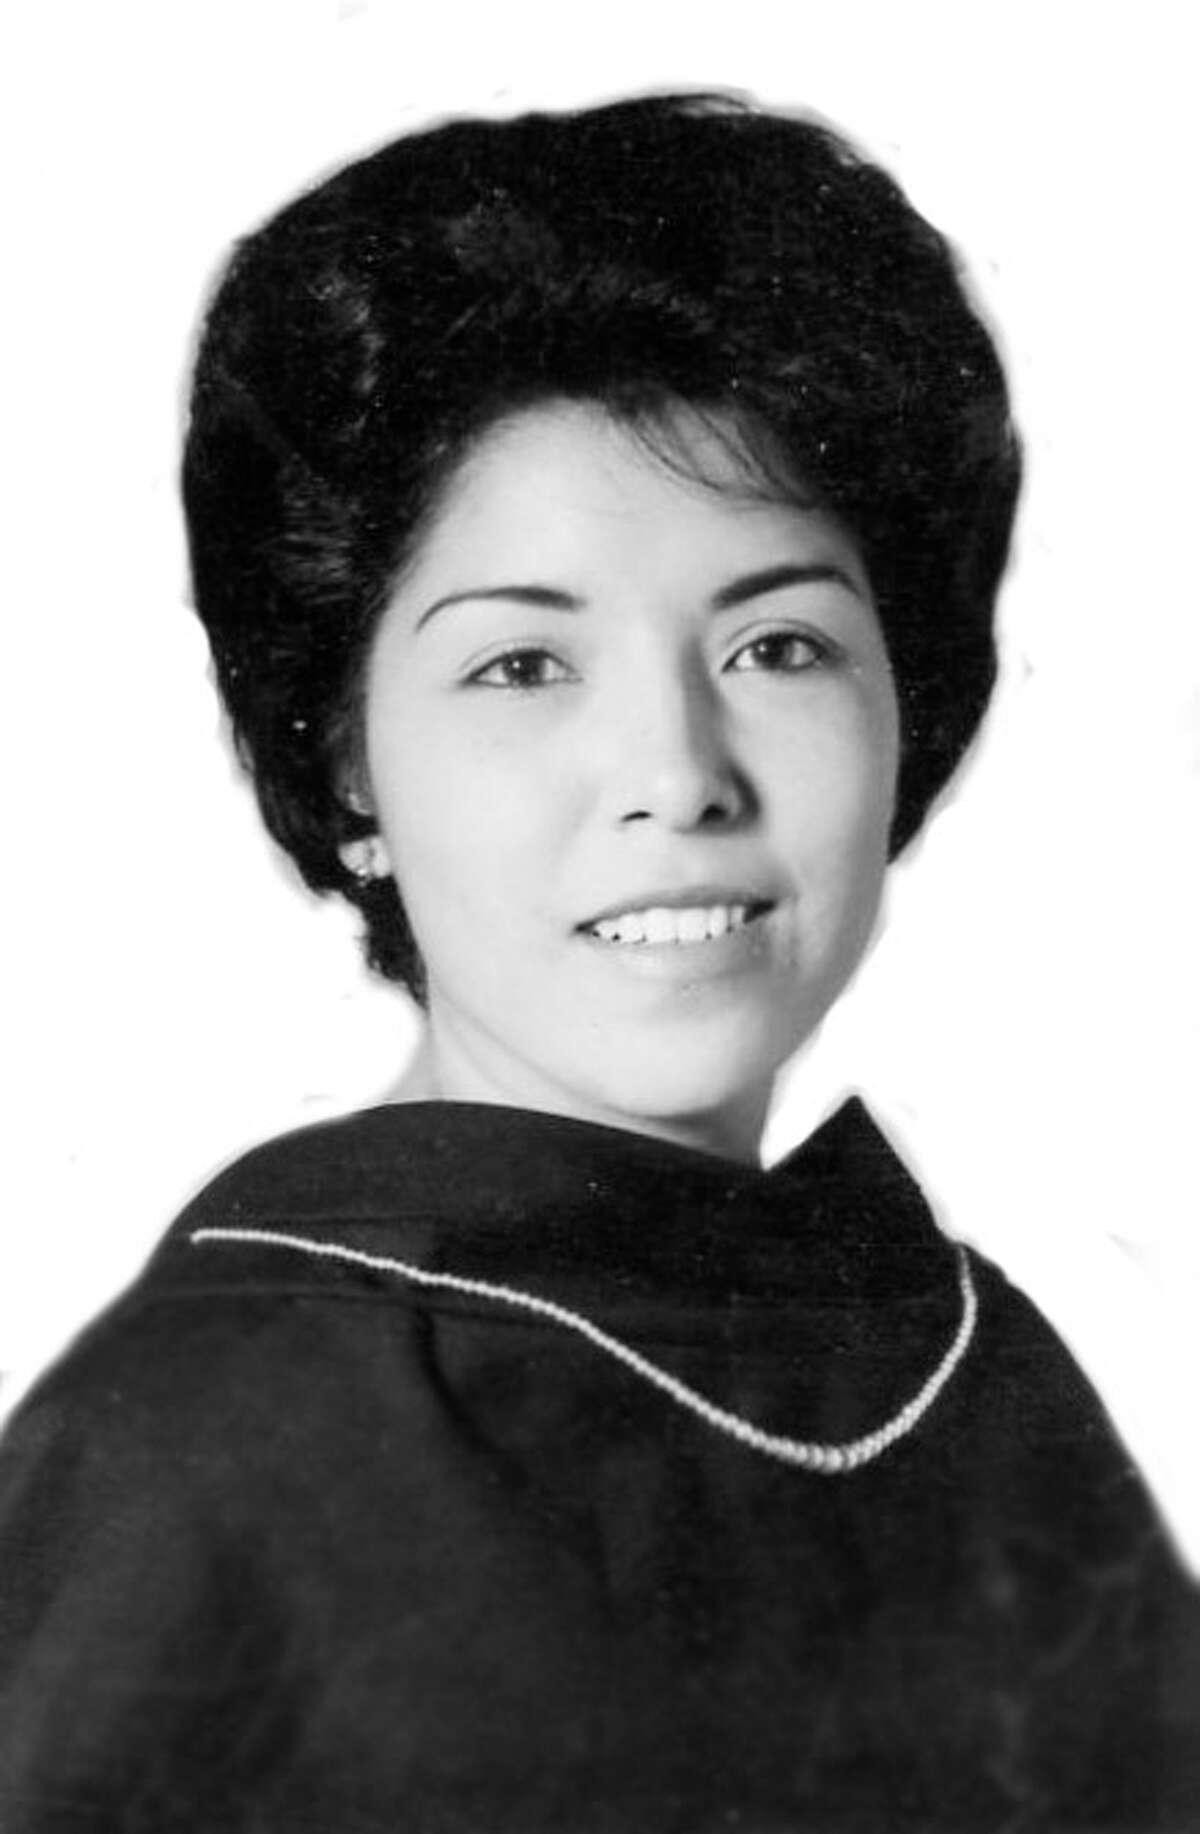 MARIA LUISA L. GONZALEZ